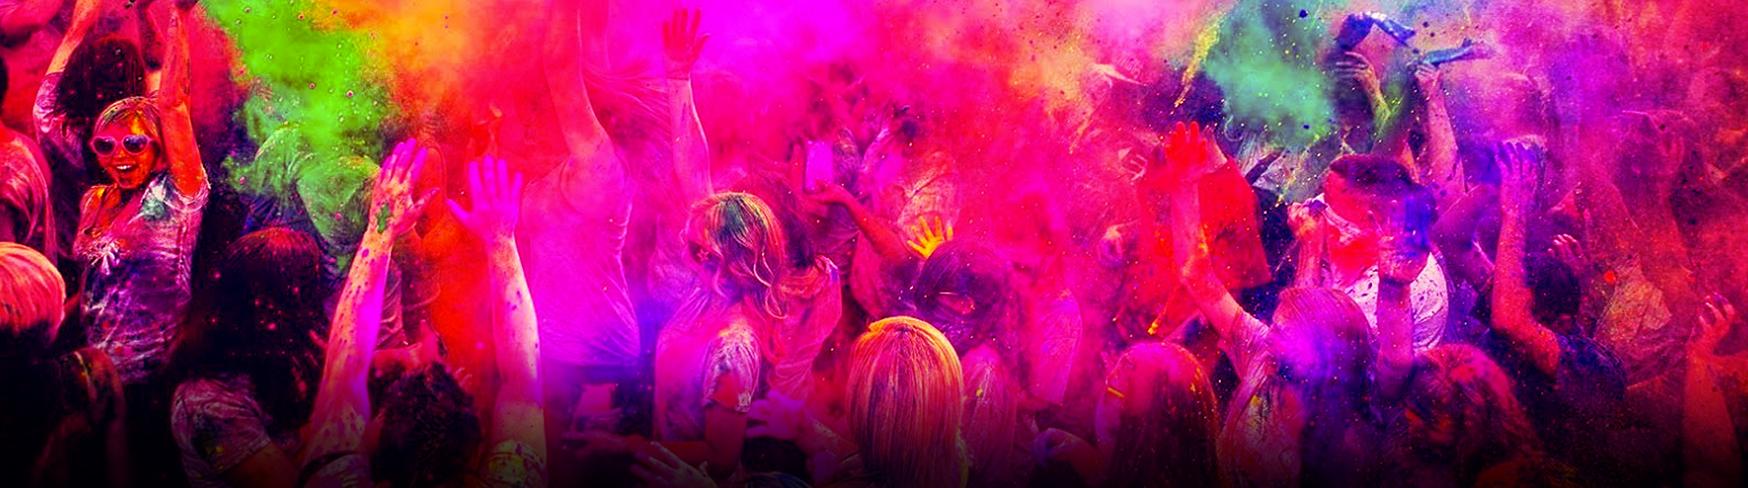 Holi Songs MP3 Download: New Hindi Holi Songs DJ Mix Free Online on  Gaana.com